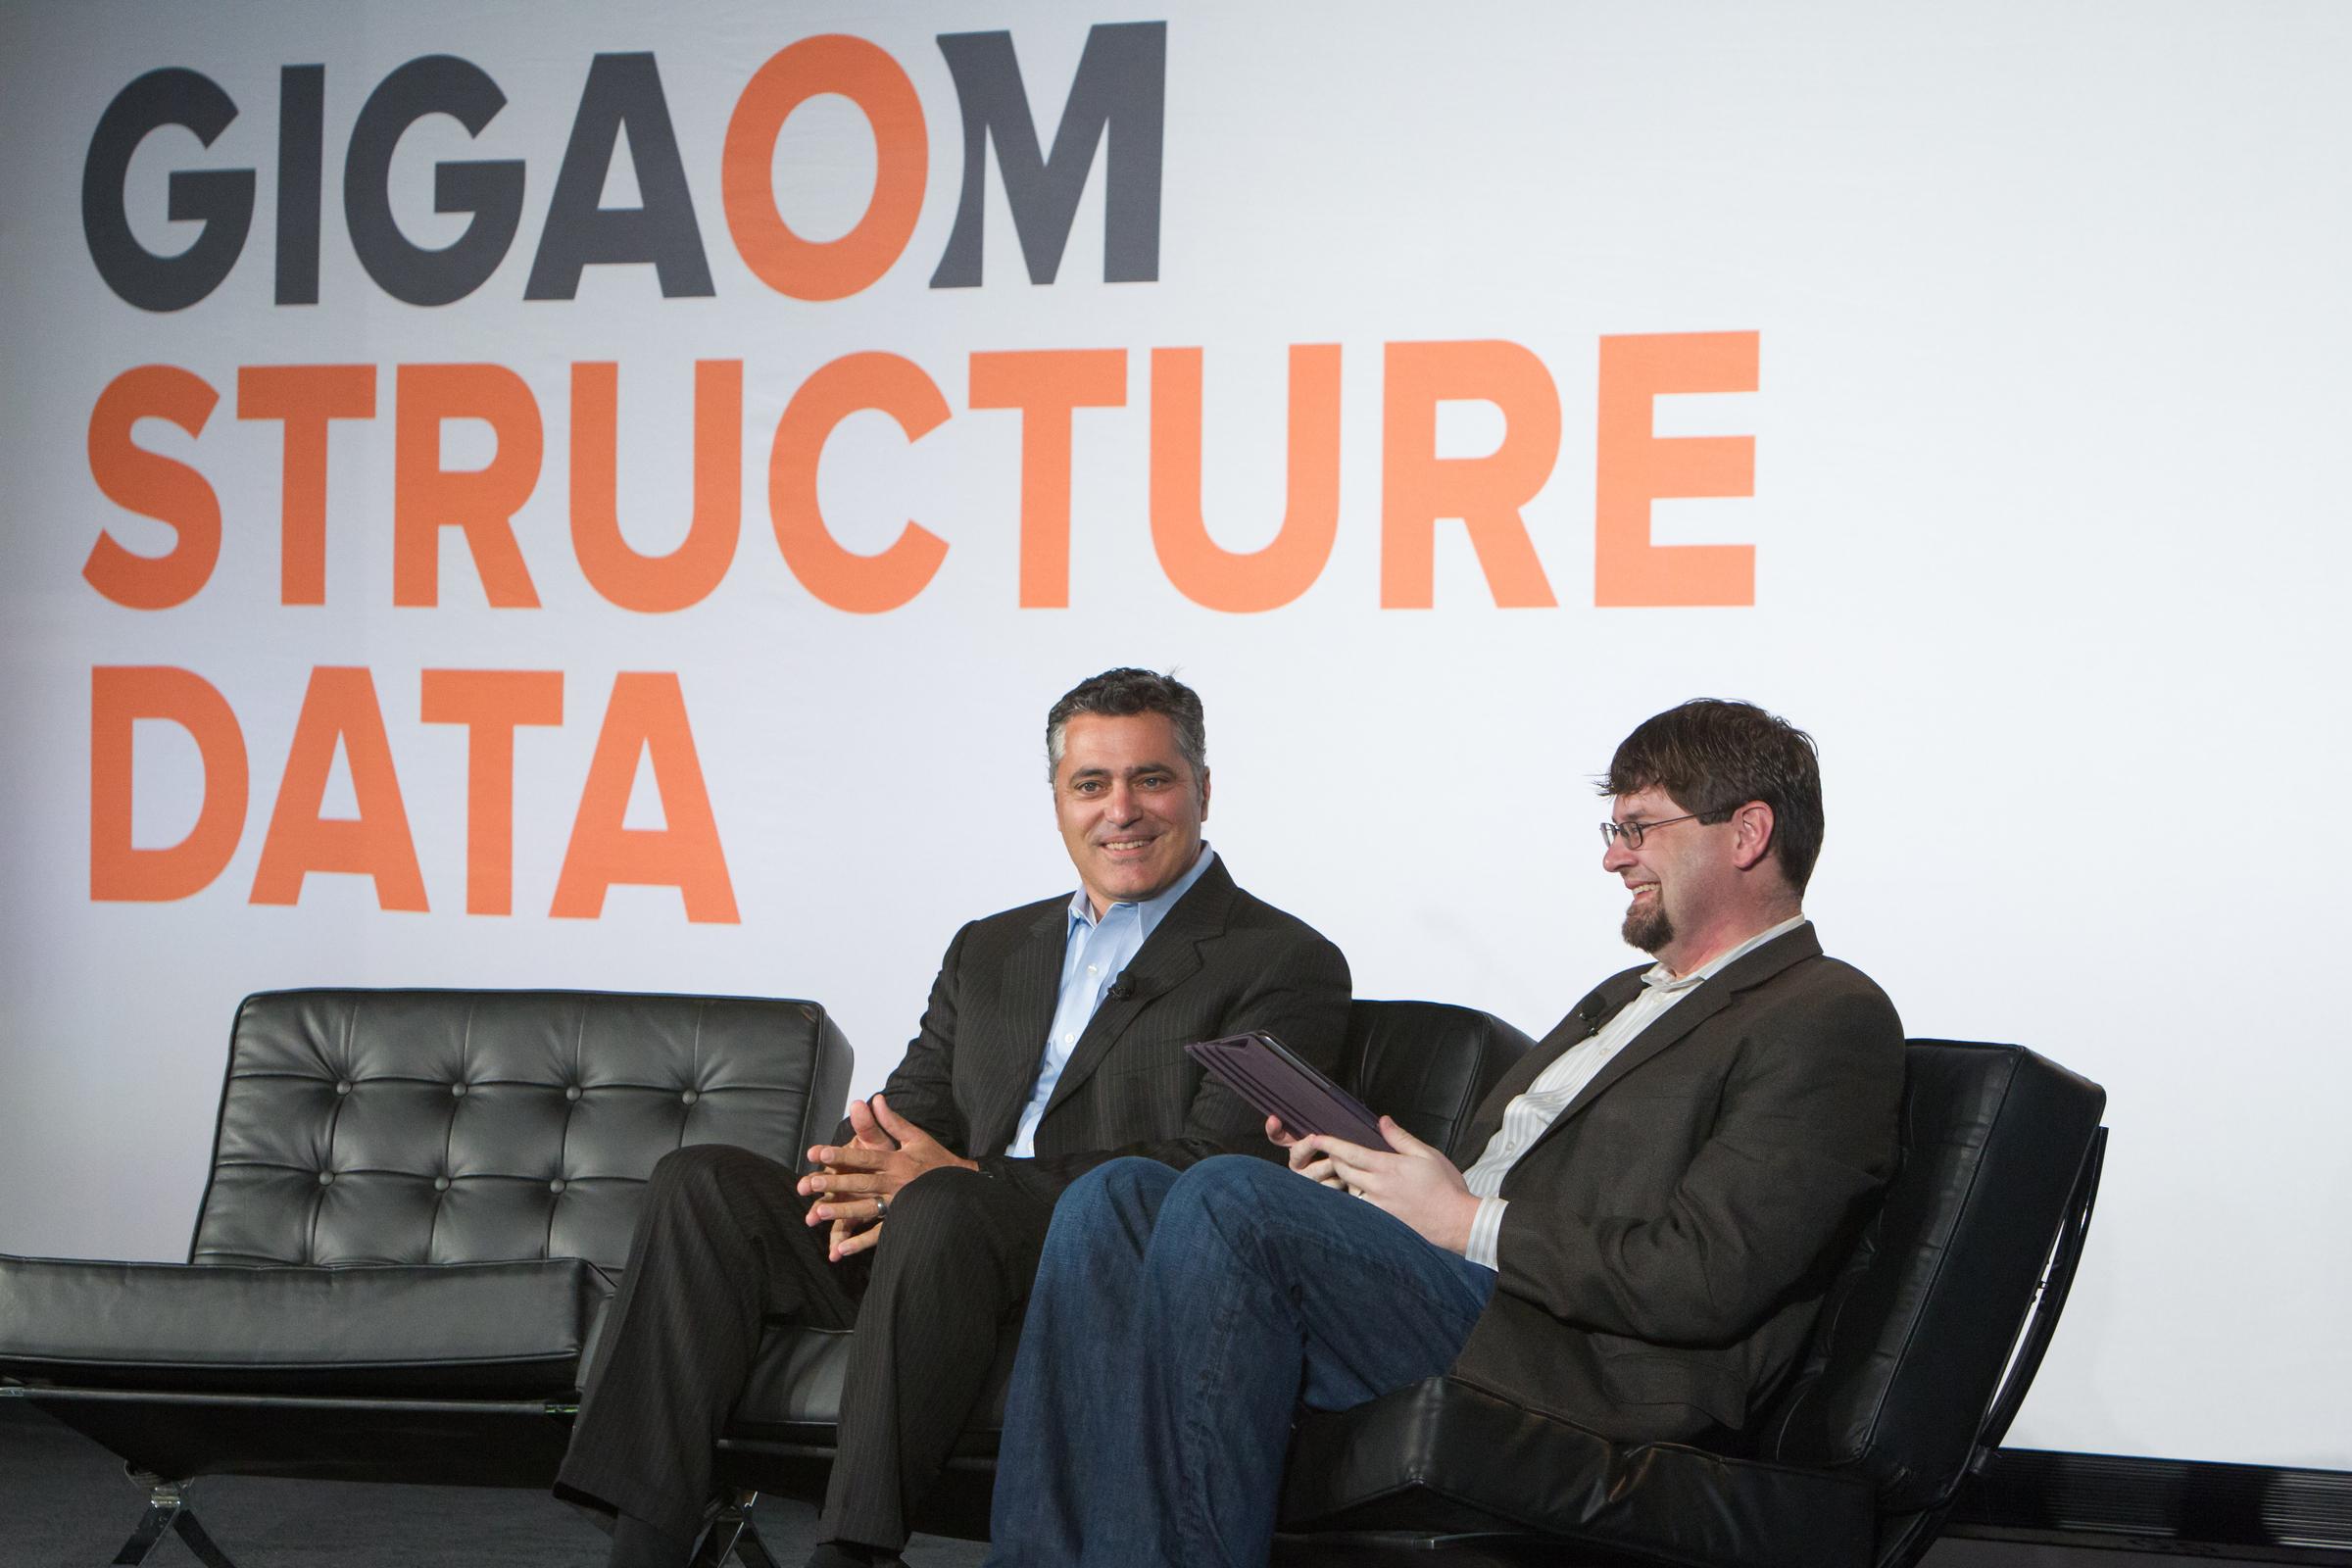 Tom Reilly (left) at Structure Data 2014. (c) Jakub Moser / http://jakubmosur.photoshelter.com